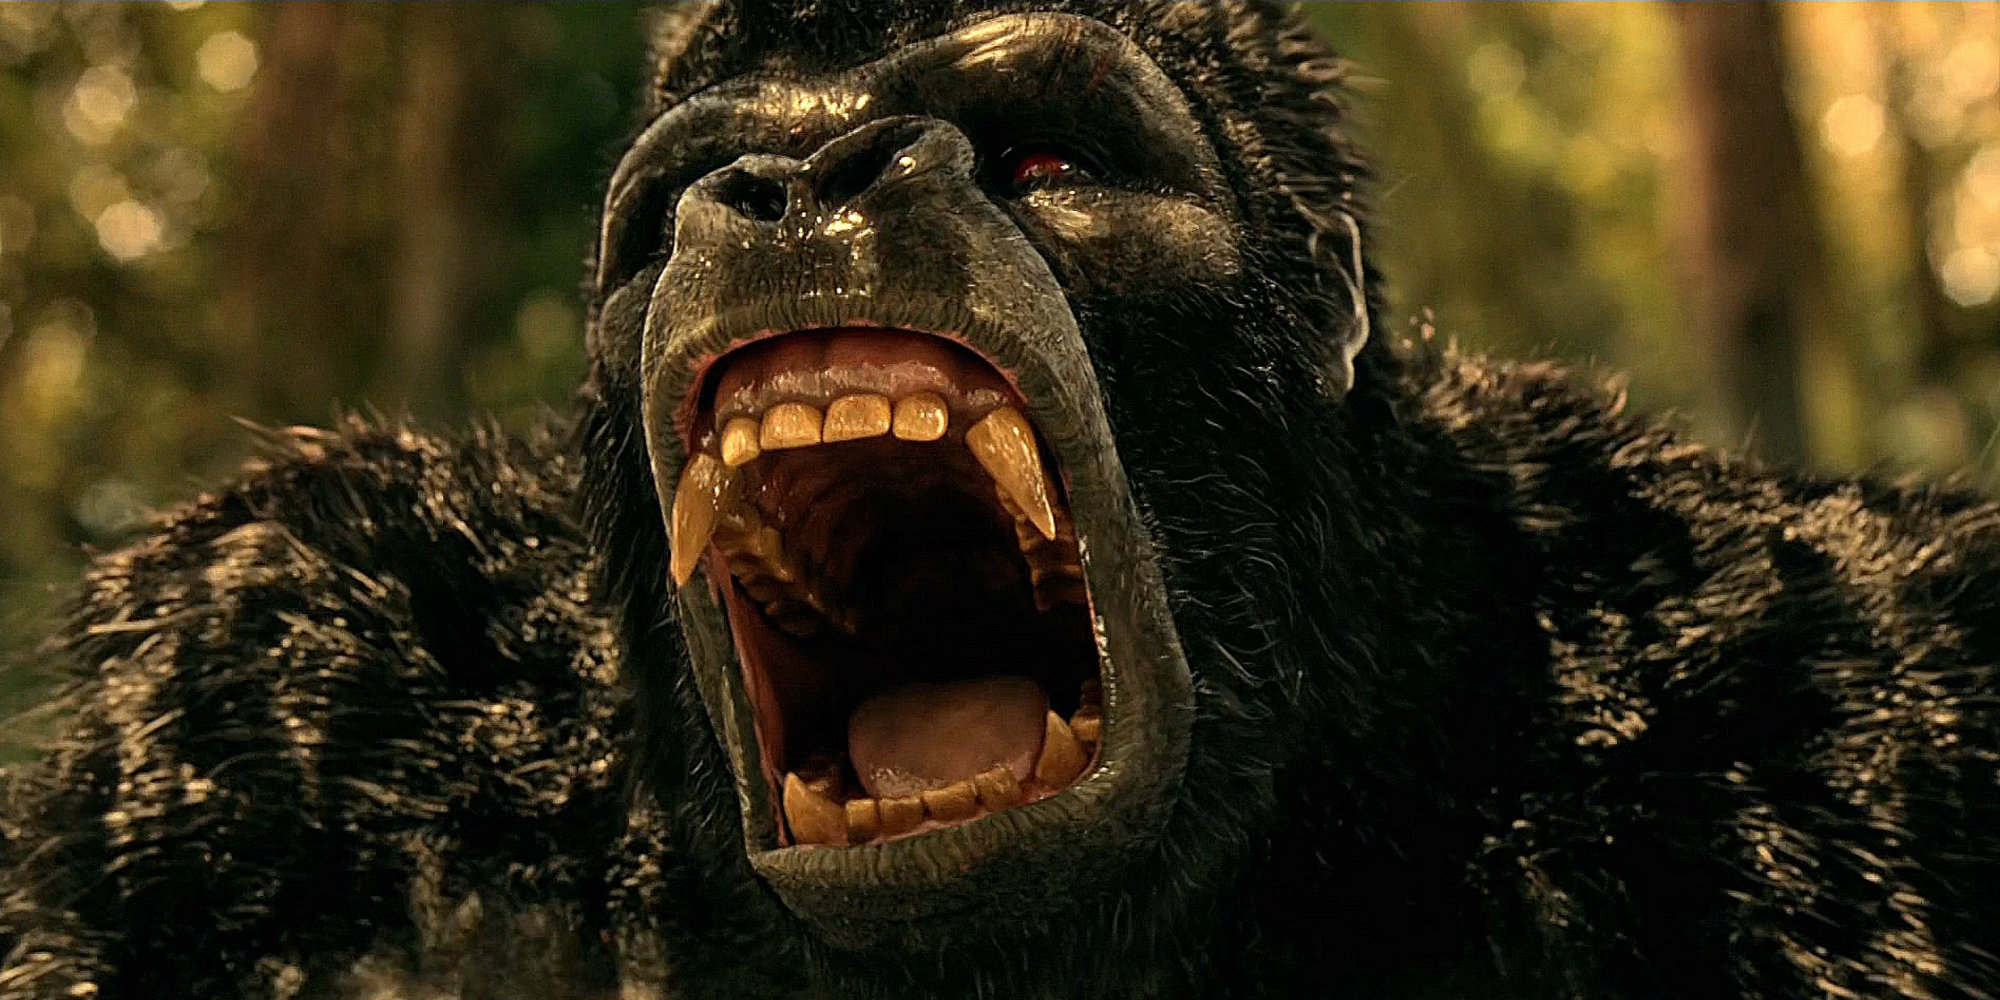 The Flash season 2 - Gorilla Grodd